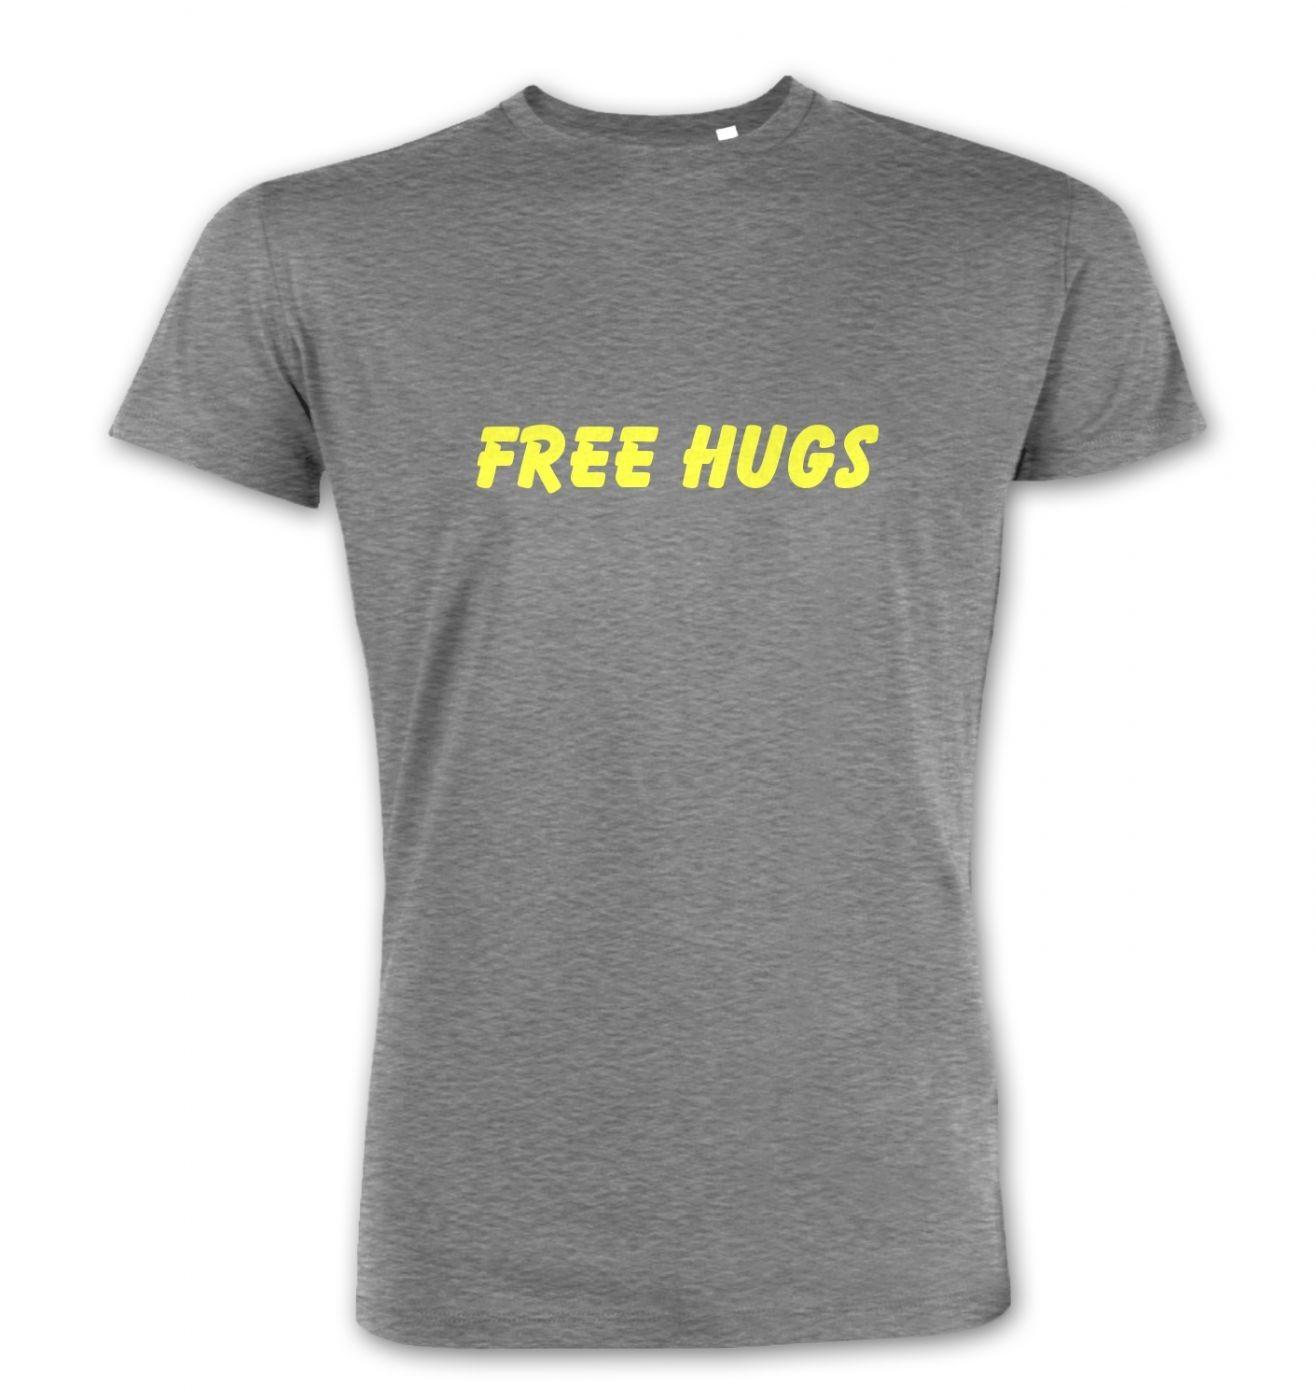 Free hugs Men's Premium t-shirt